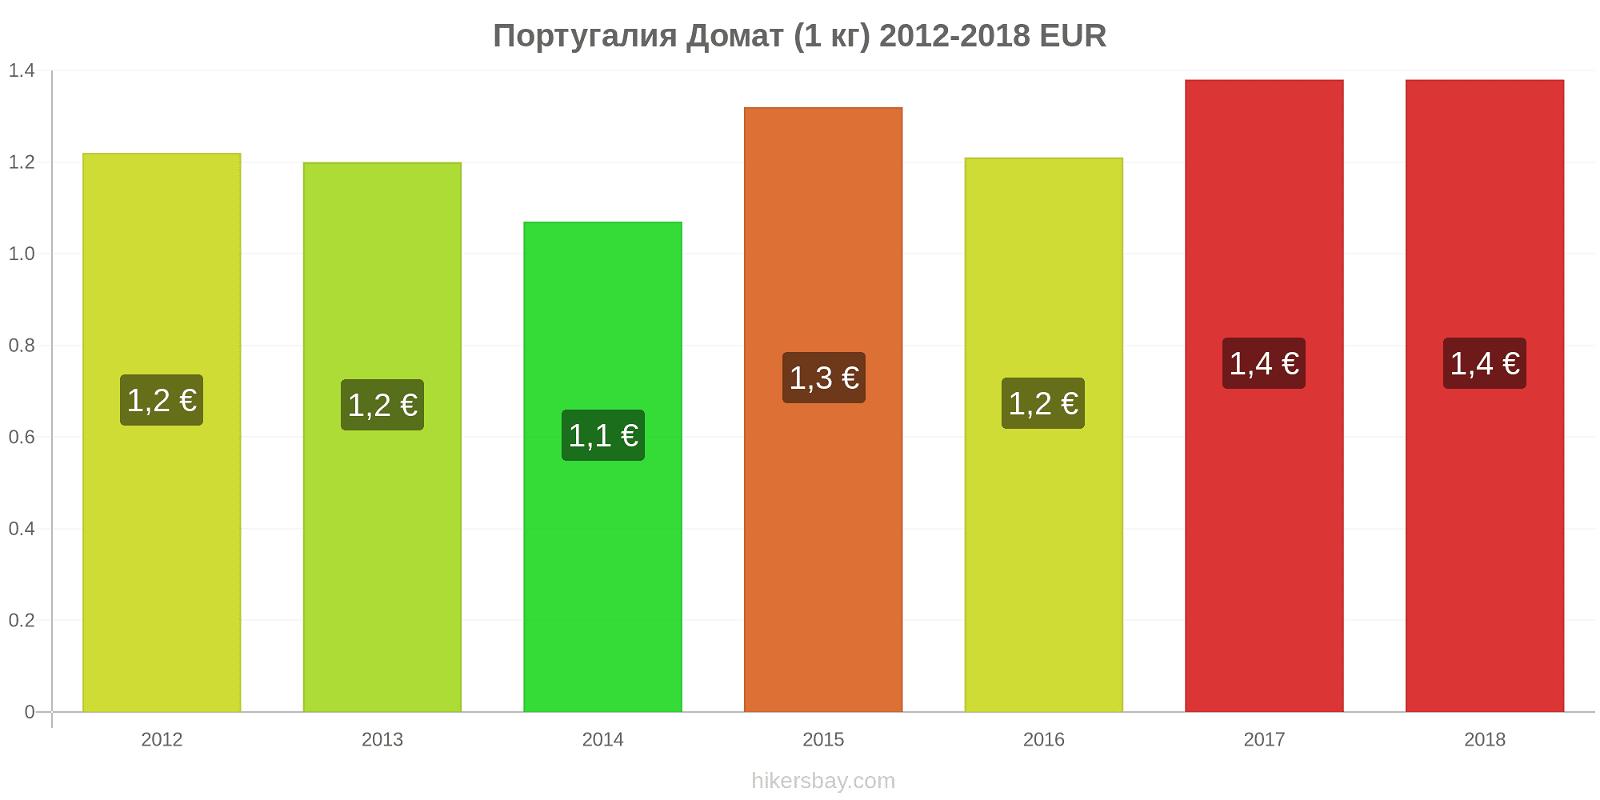 Португалия ценови промени Домат (1 кг) hikersbay.com